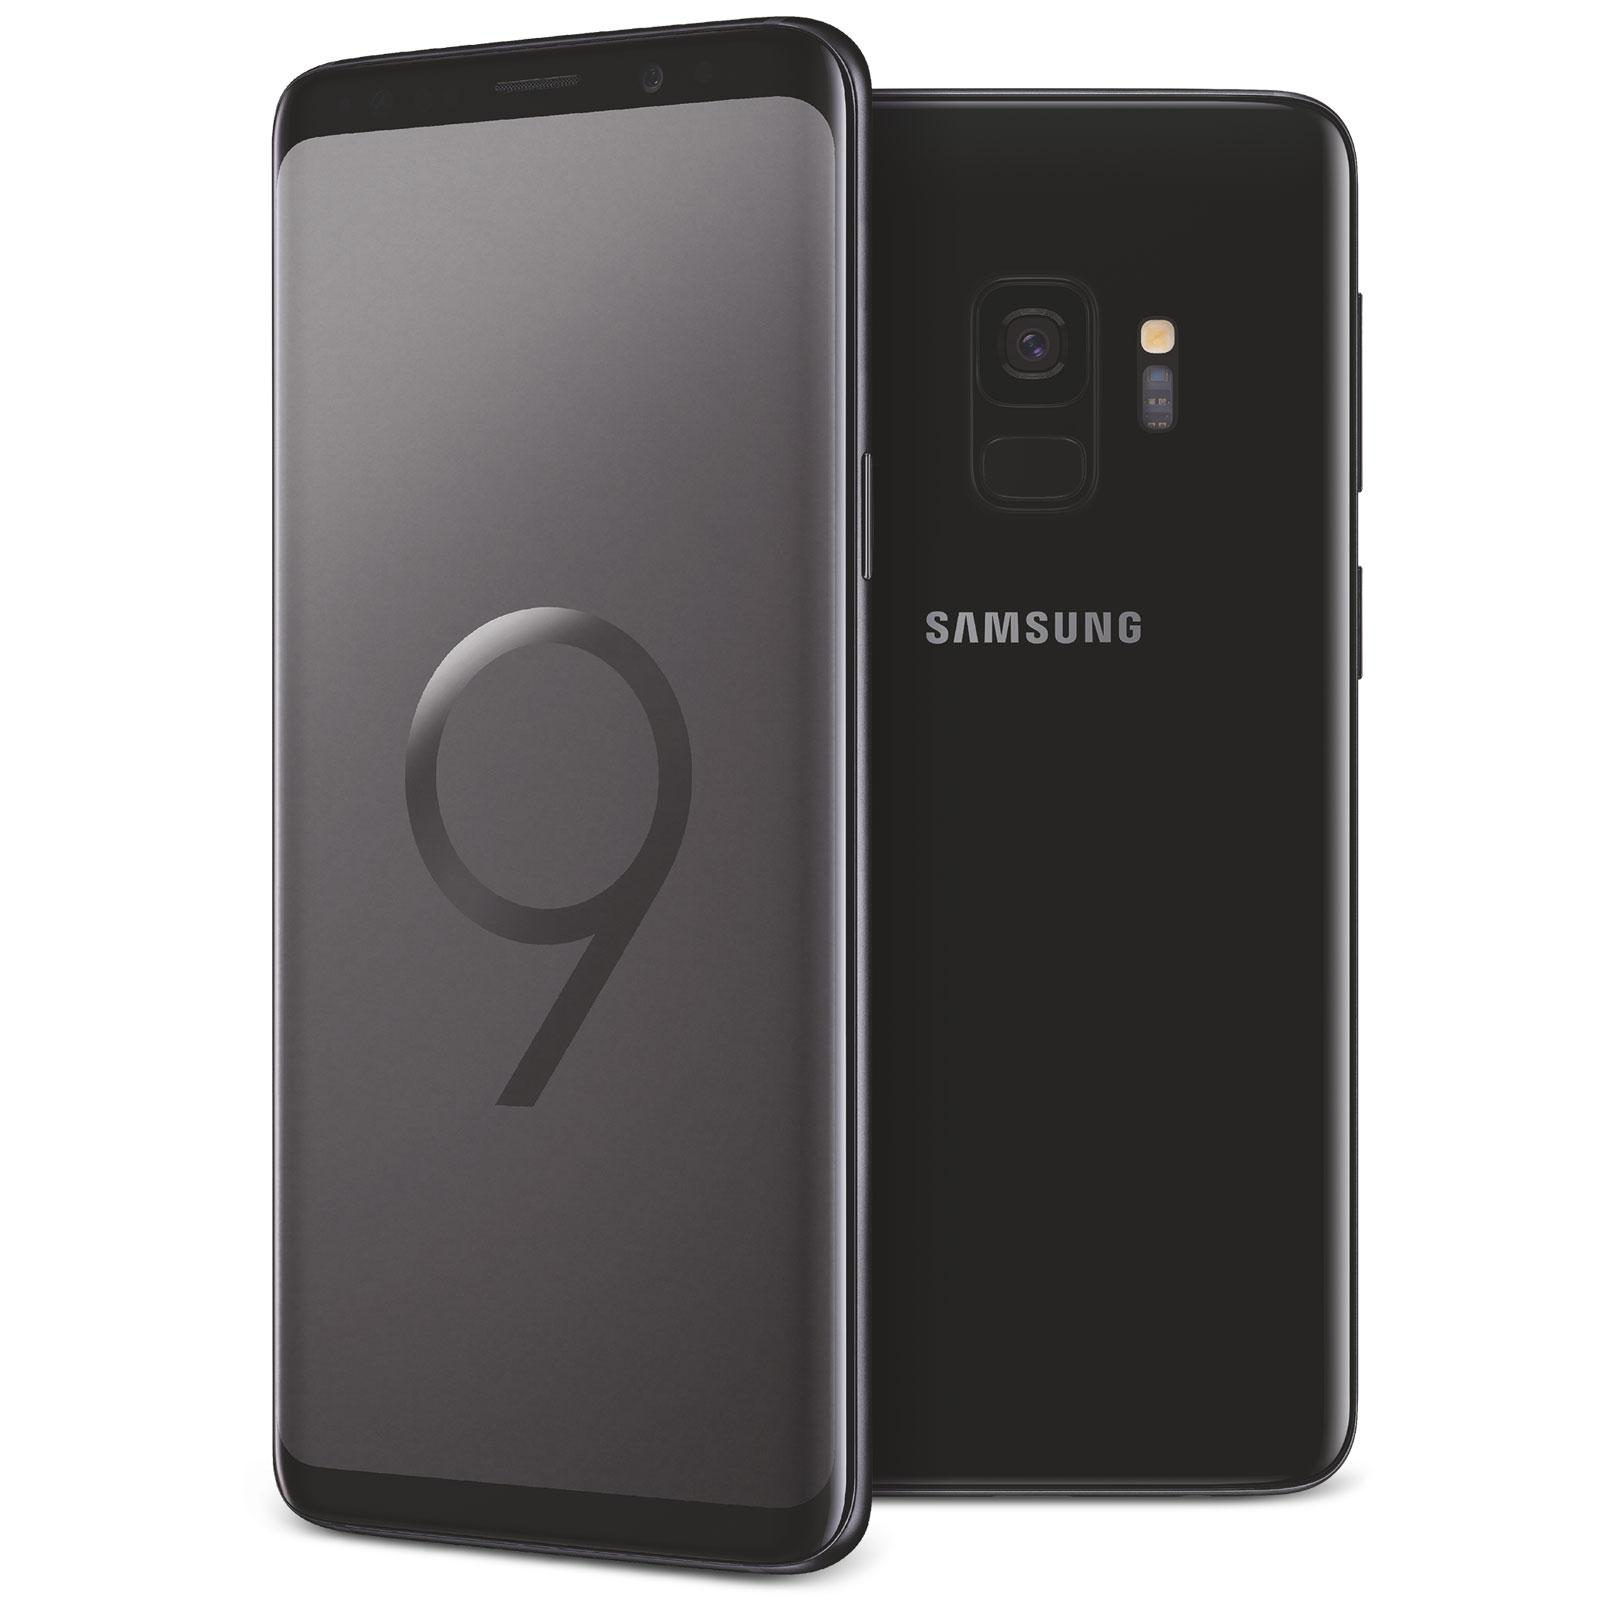 Samsung Galaxy S9 64GB Noir Carbone - Téléphonie Samsung - 0